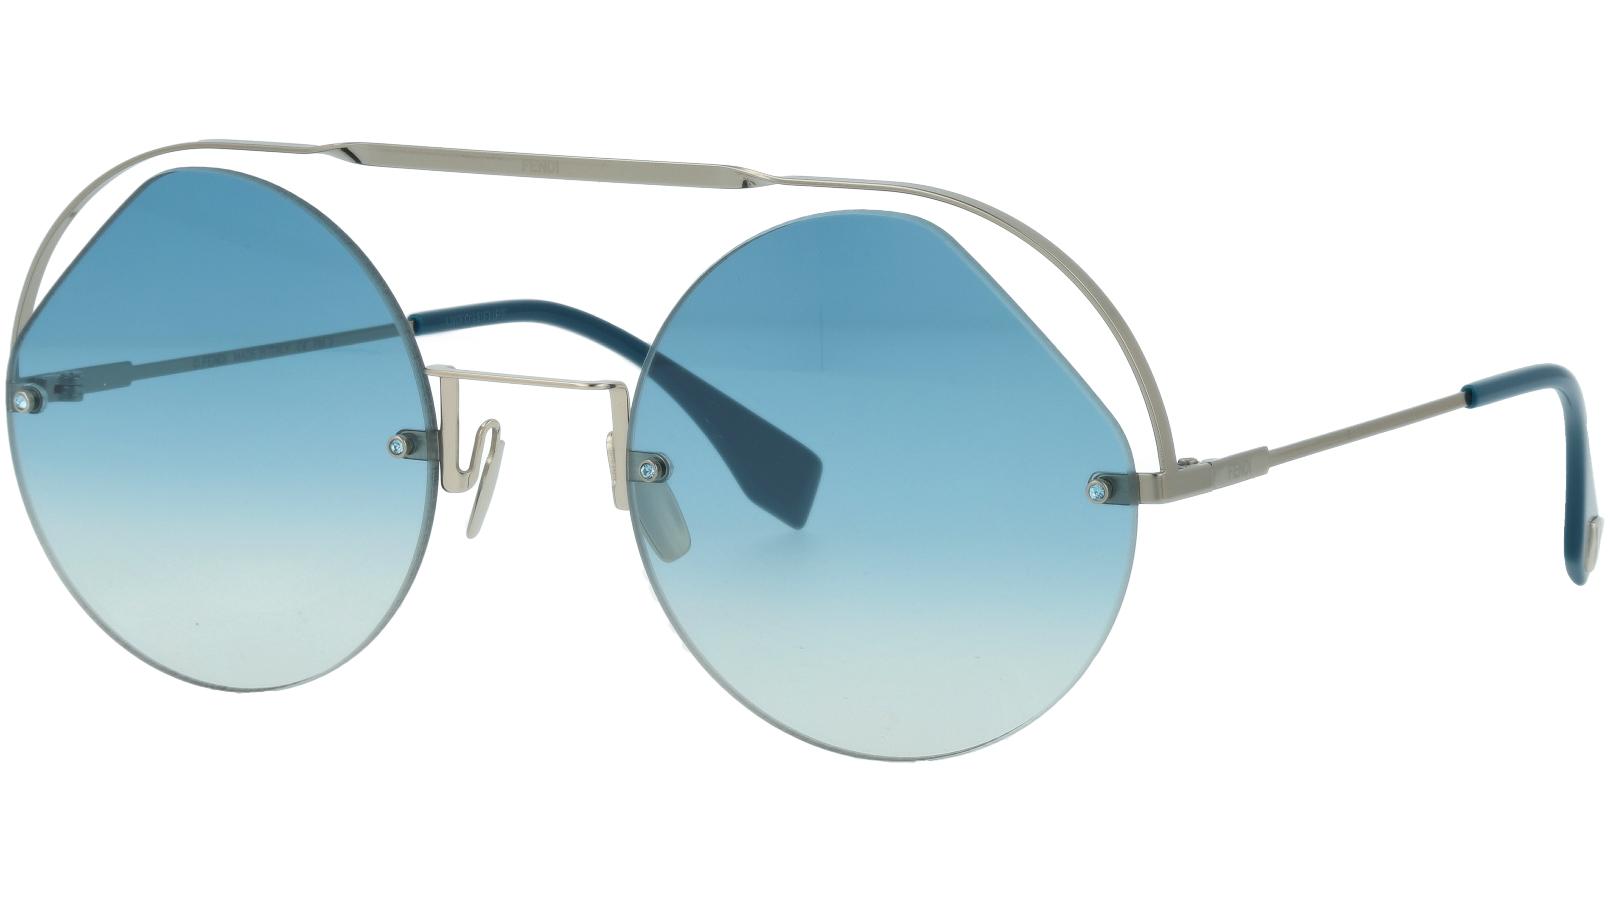 FENDI FF0325/S PJPG5 56 Blue Silver Round Sunglasses